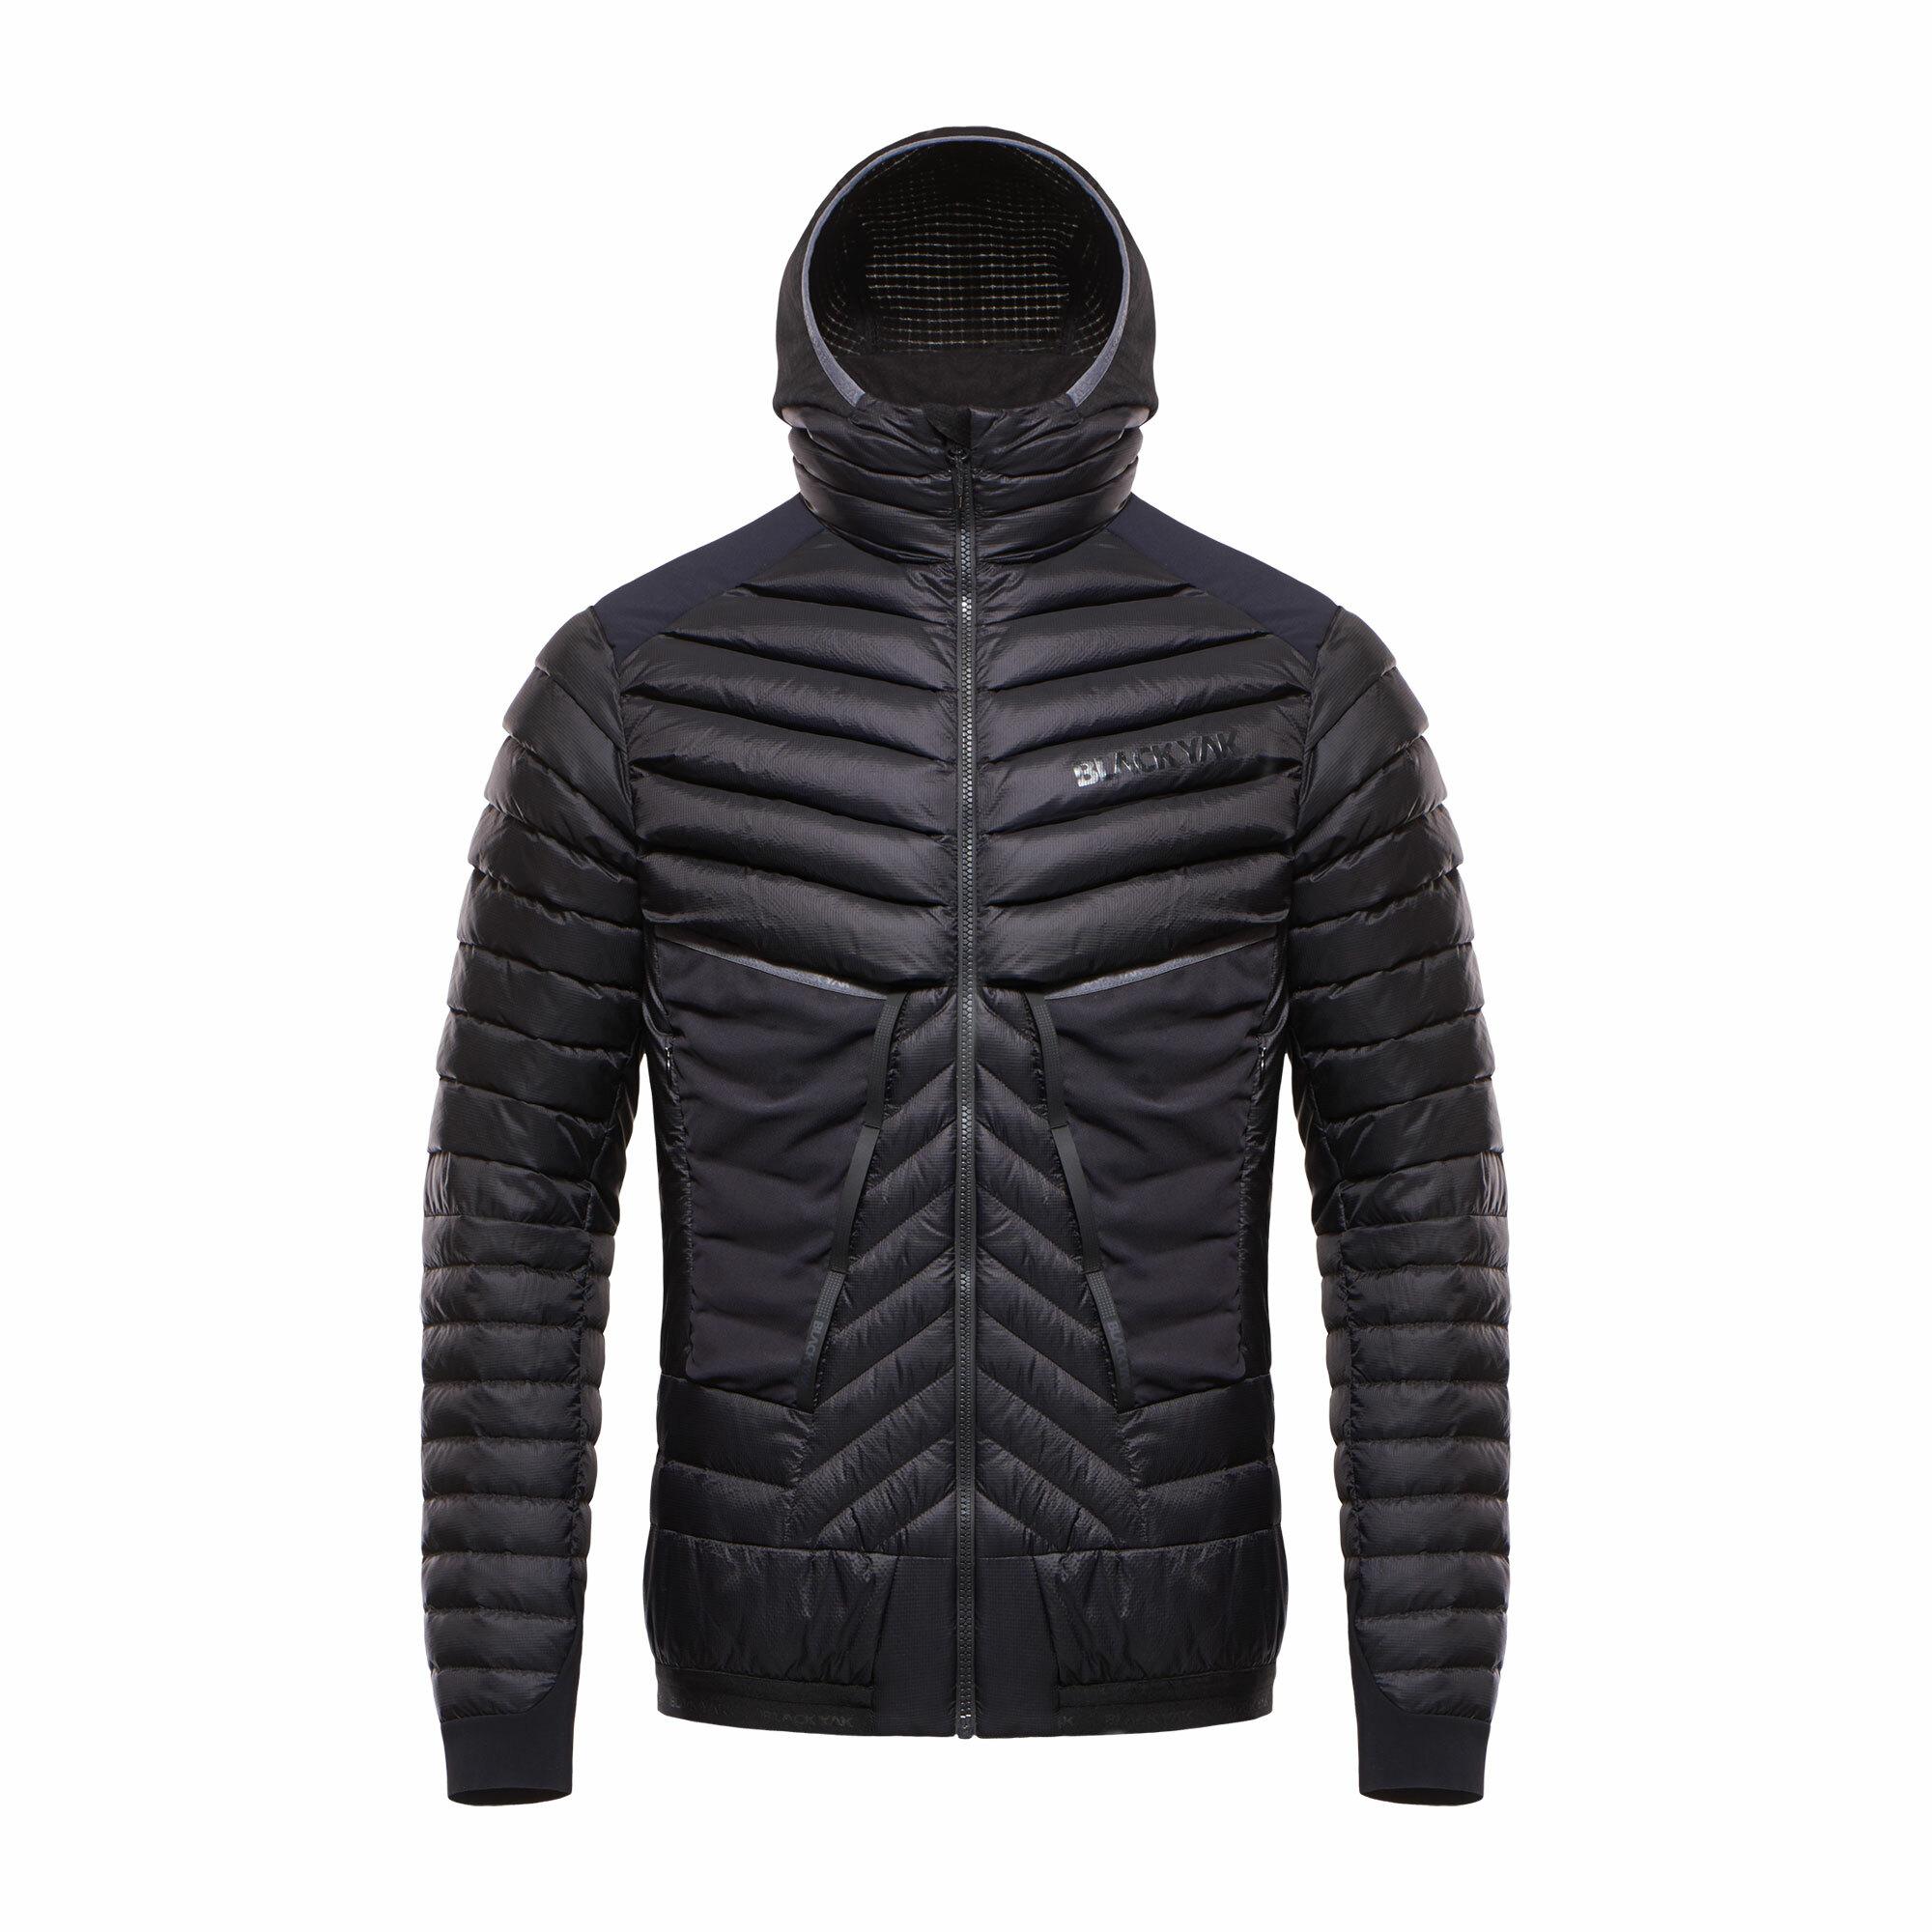 Black Yak Hybrid Jacket